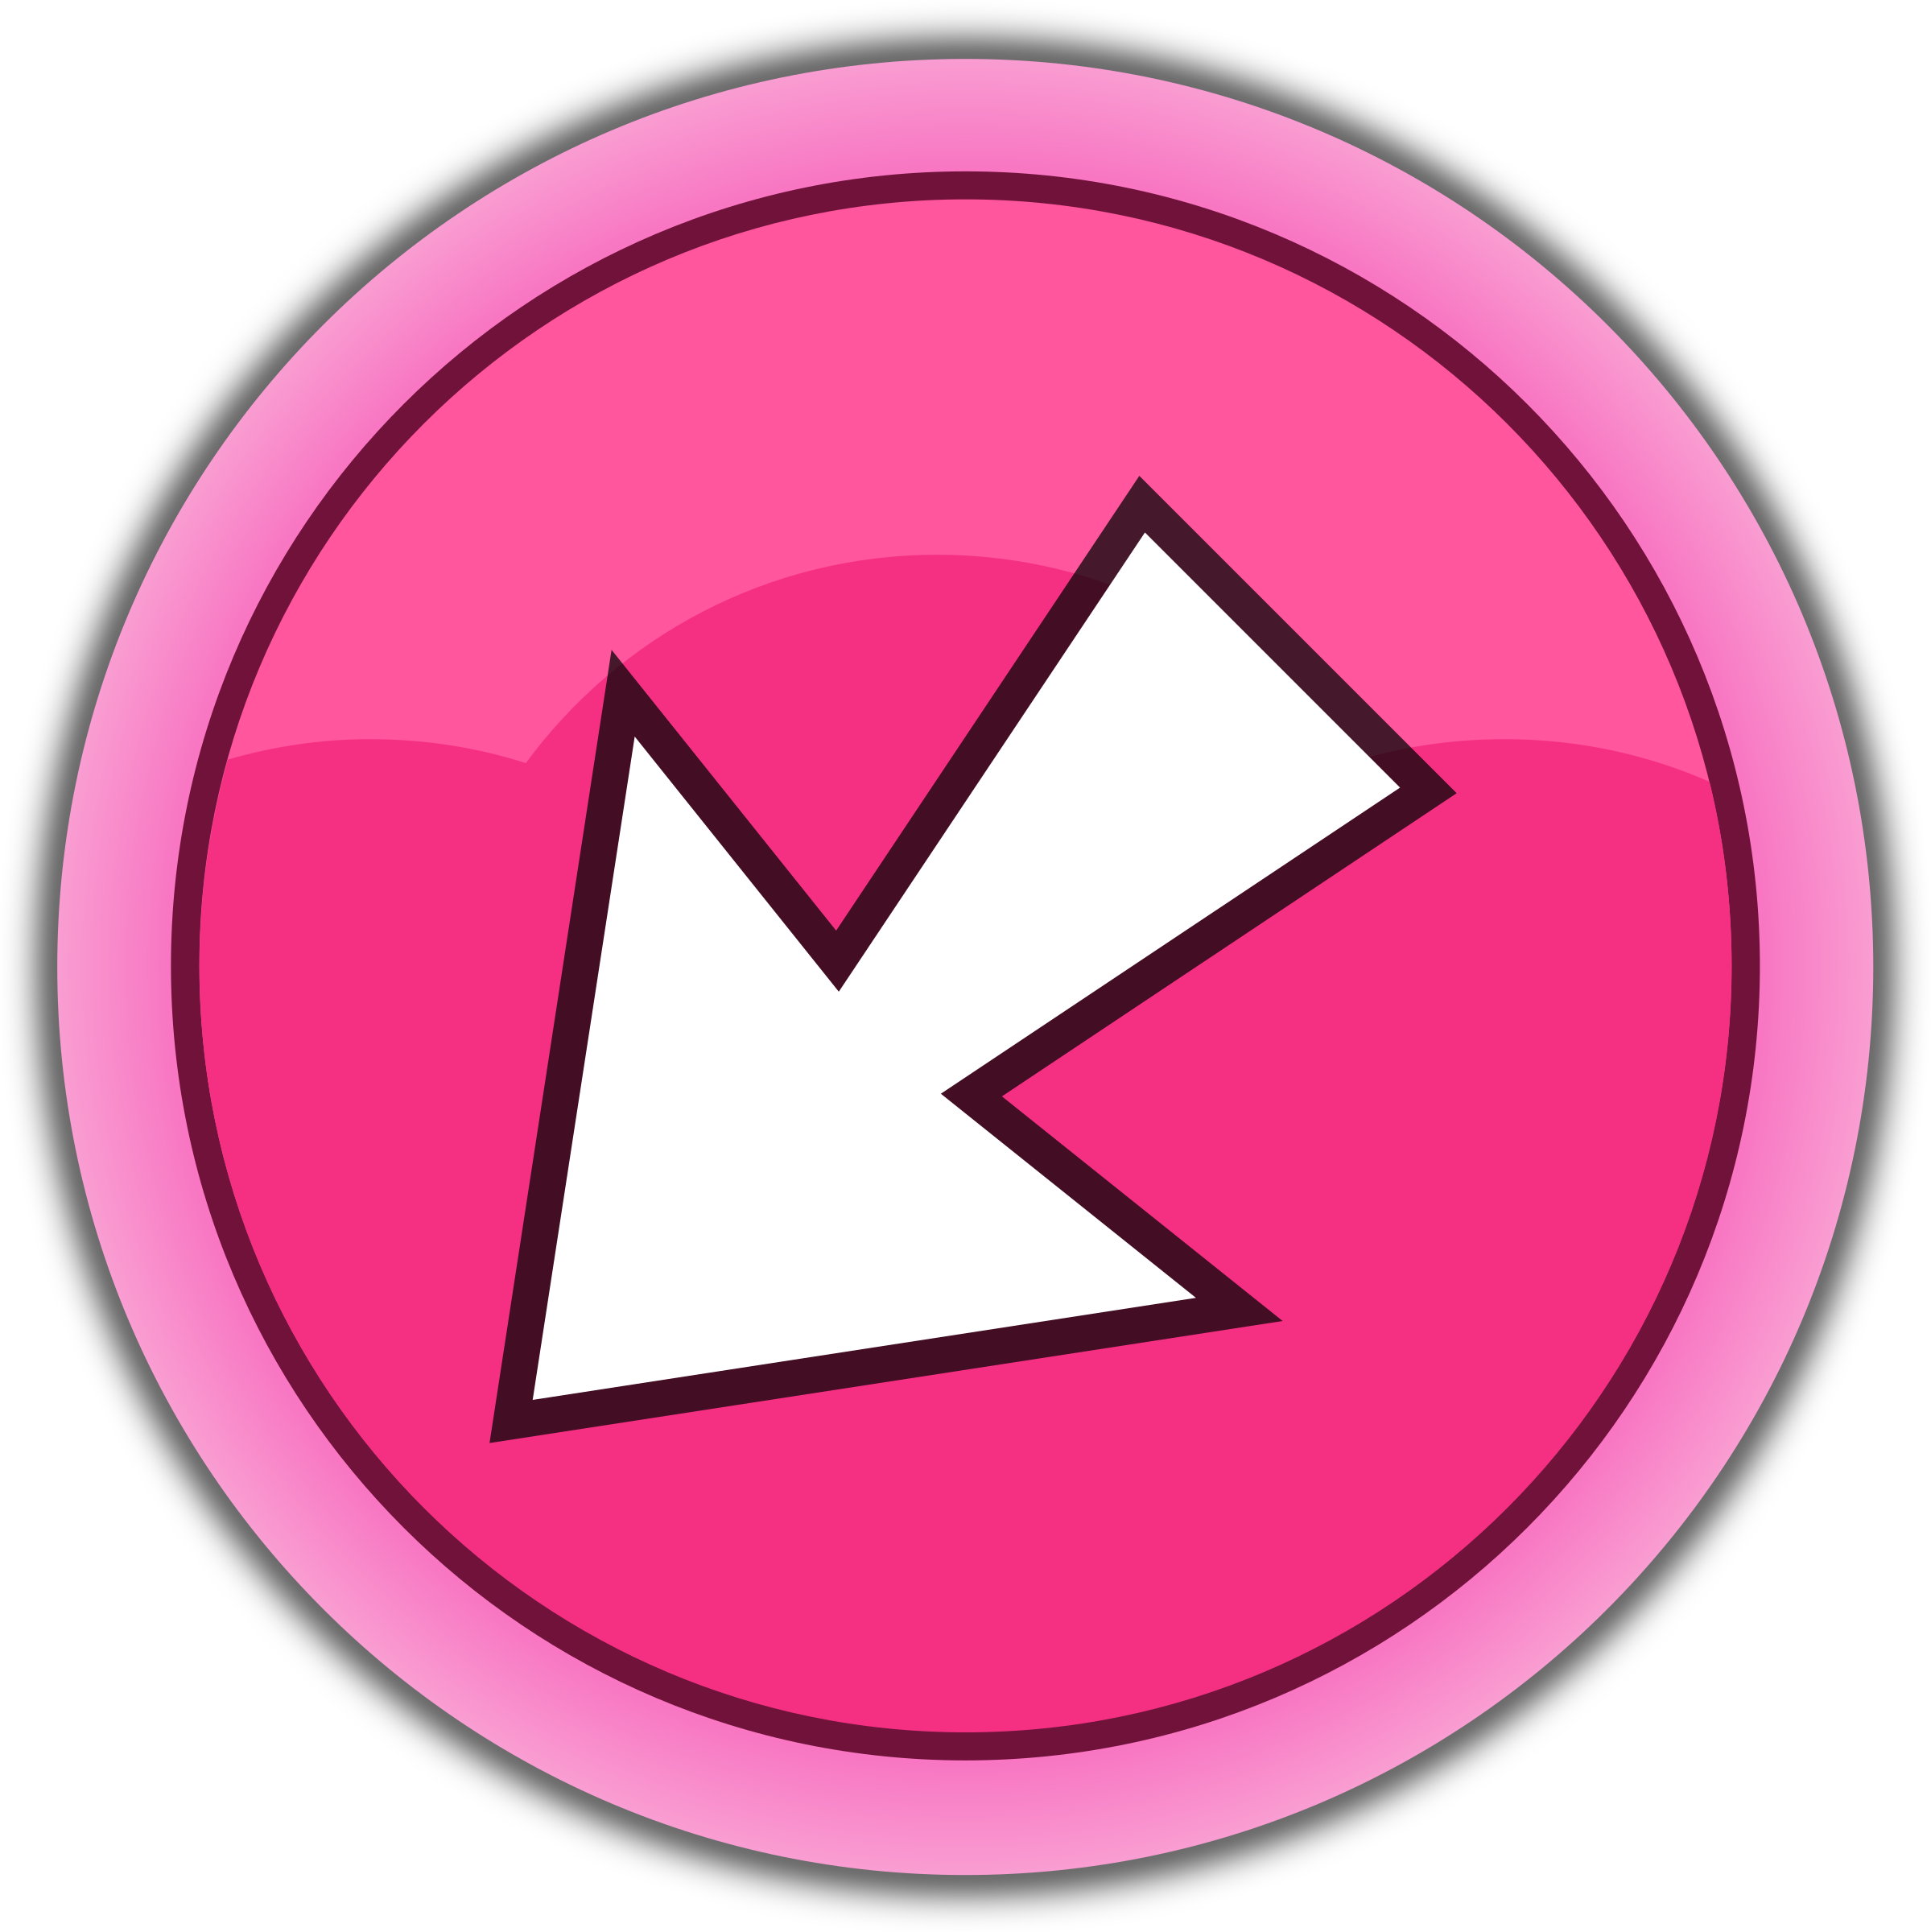 Pink big image png. Back clipart arrow